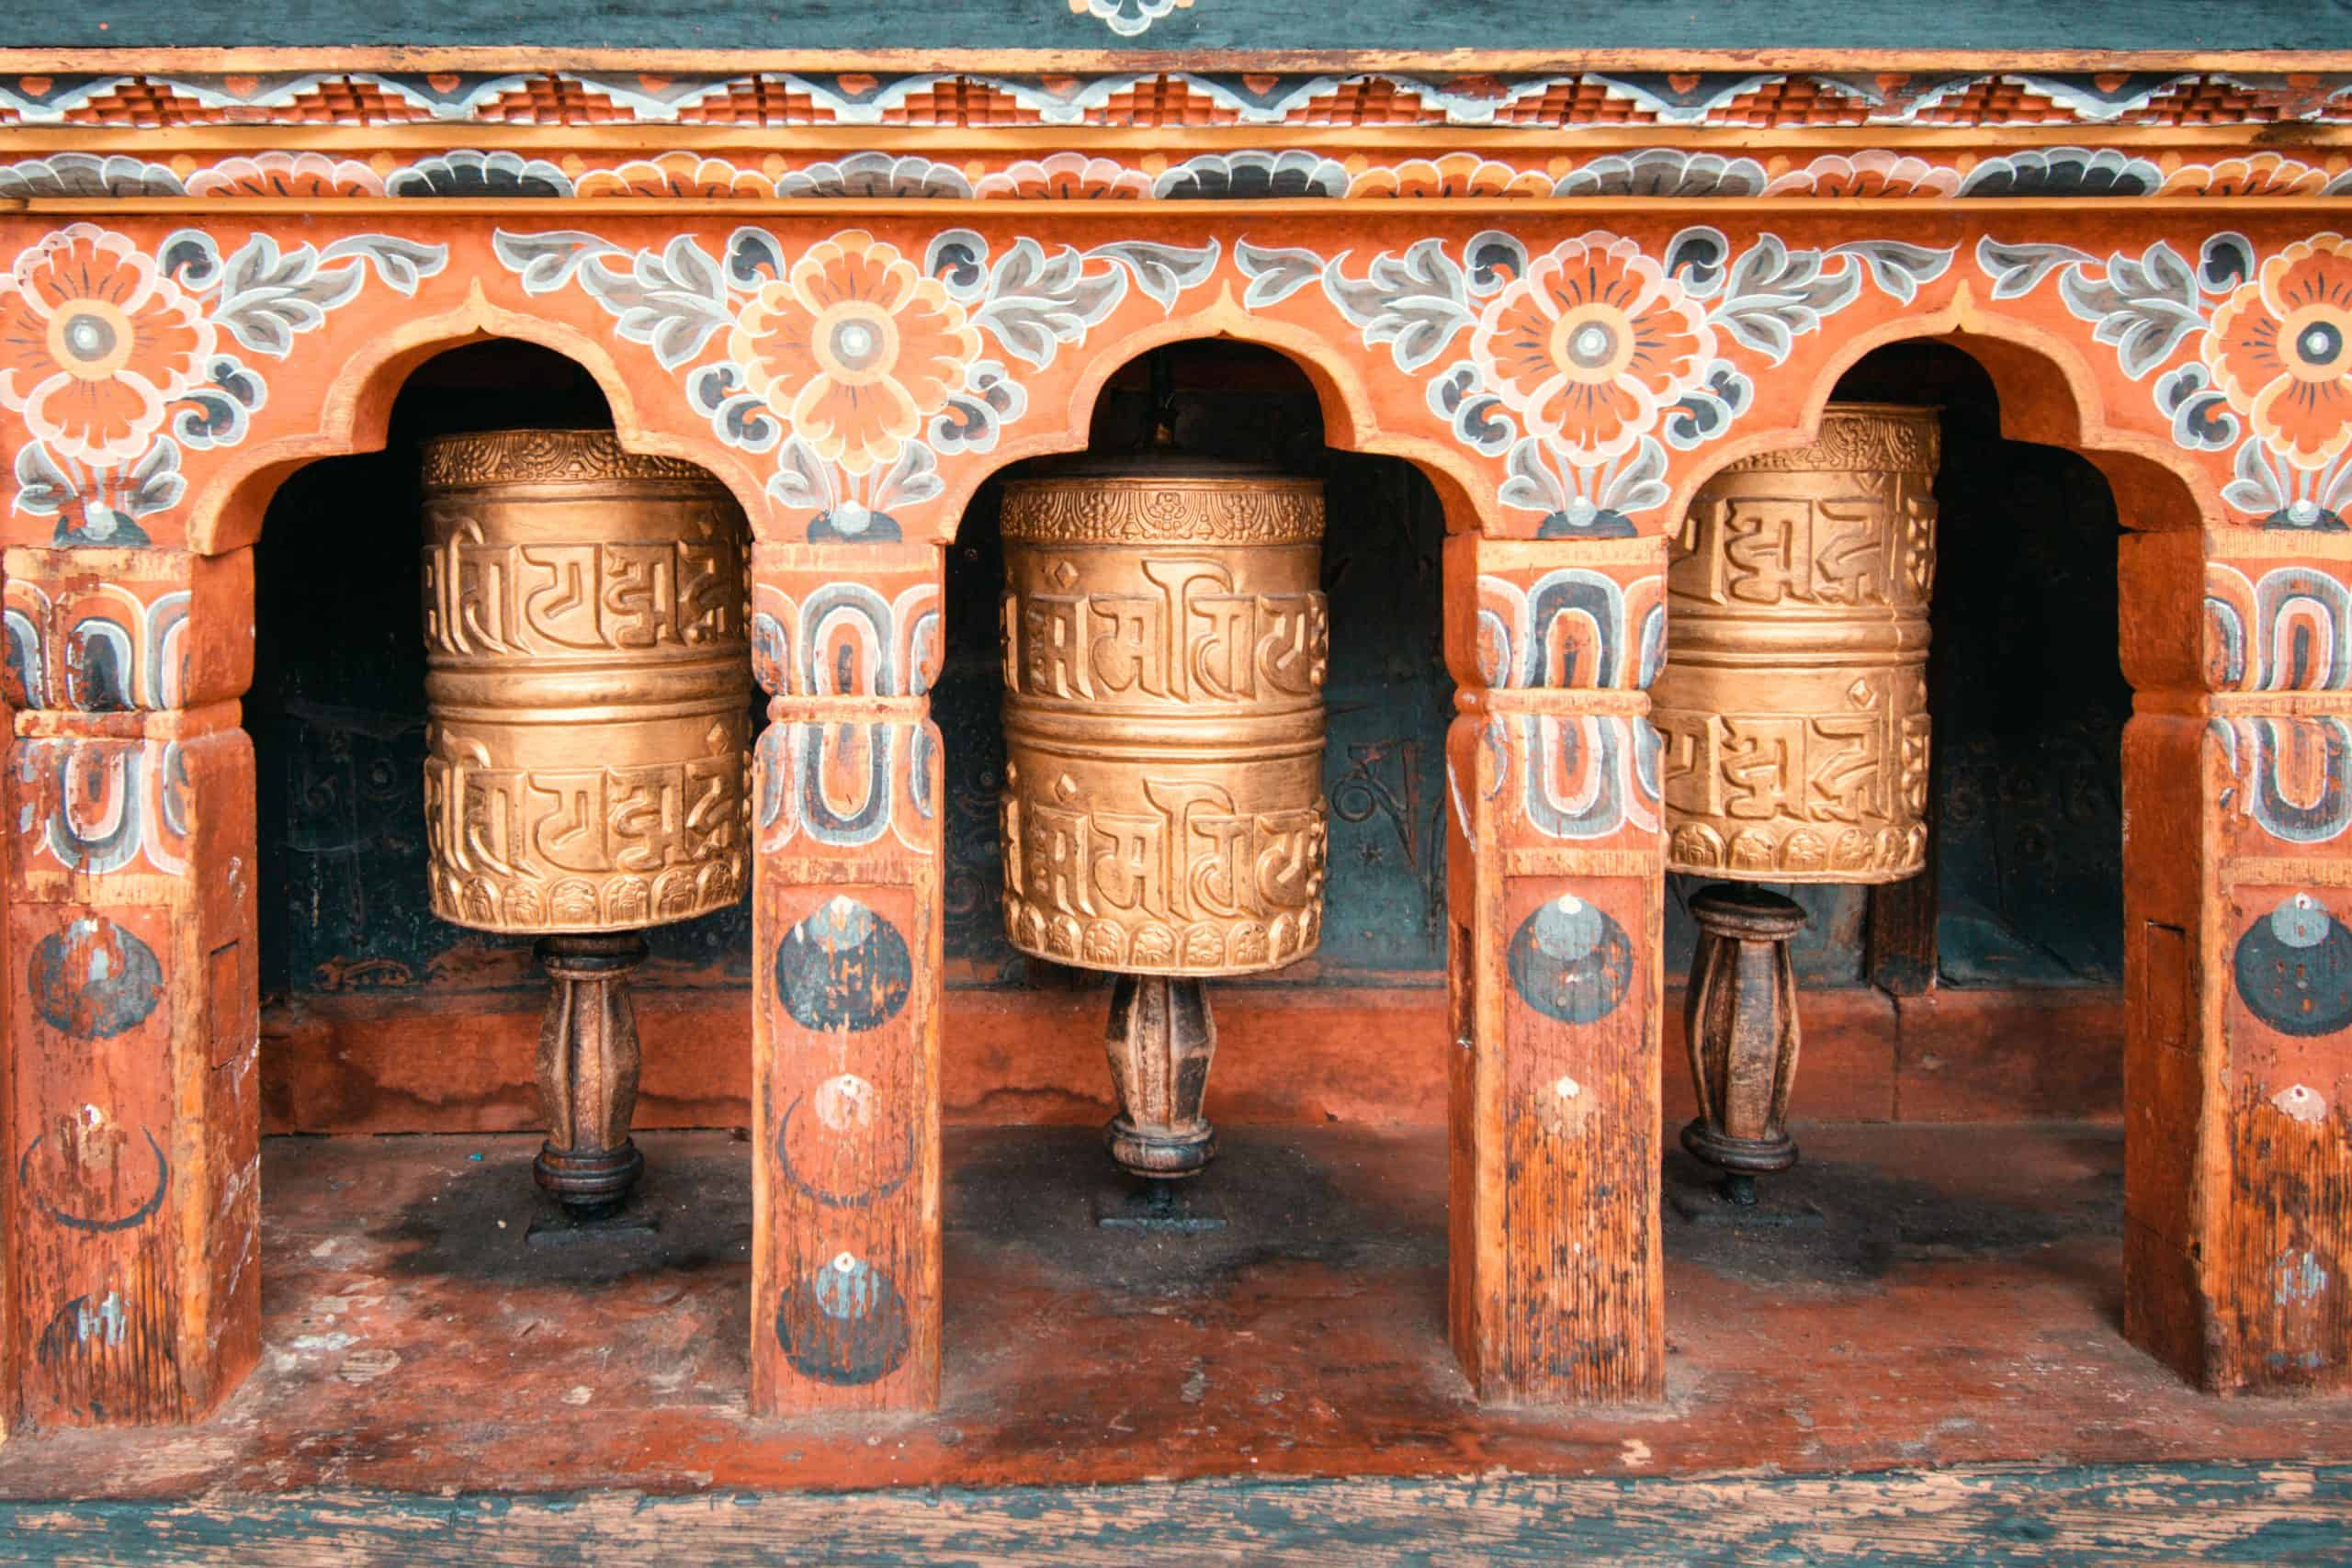 Bhutanese Prayer Wheels